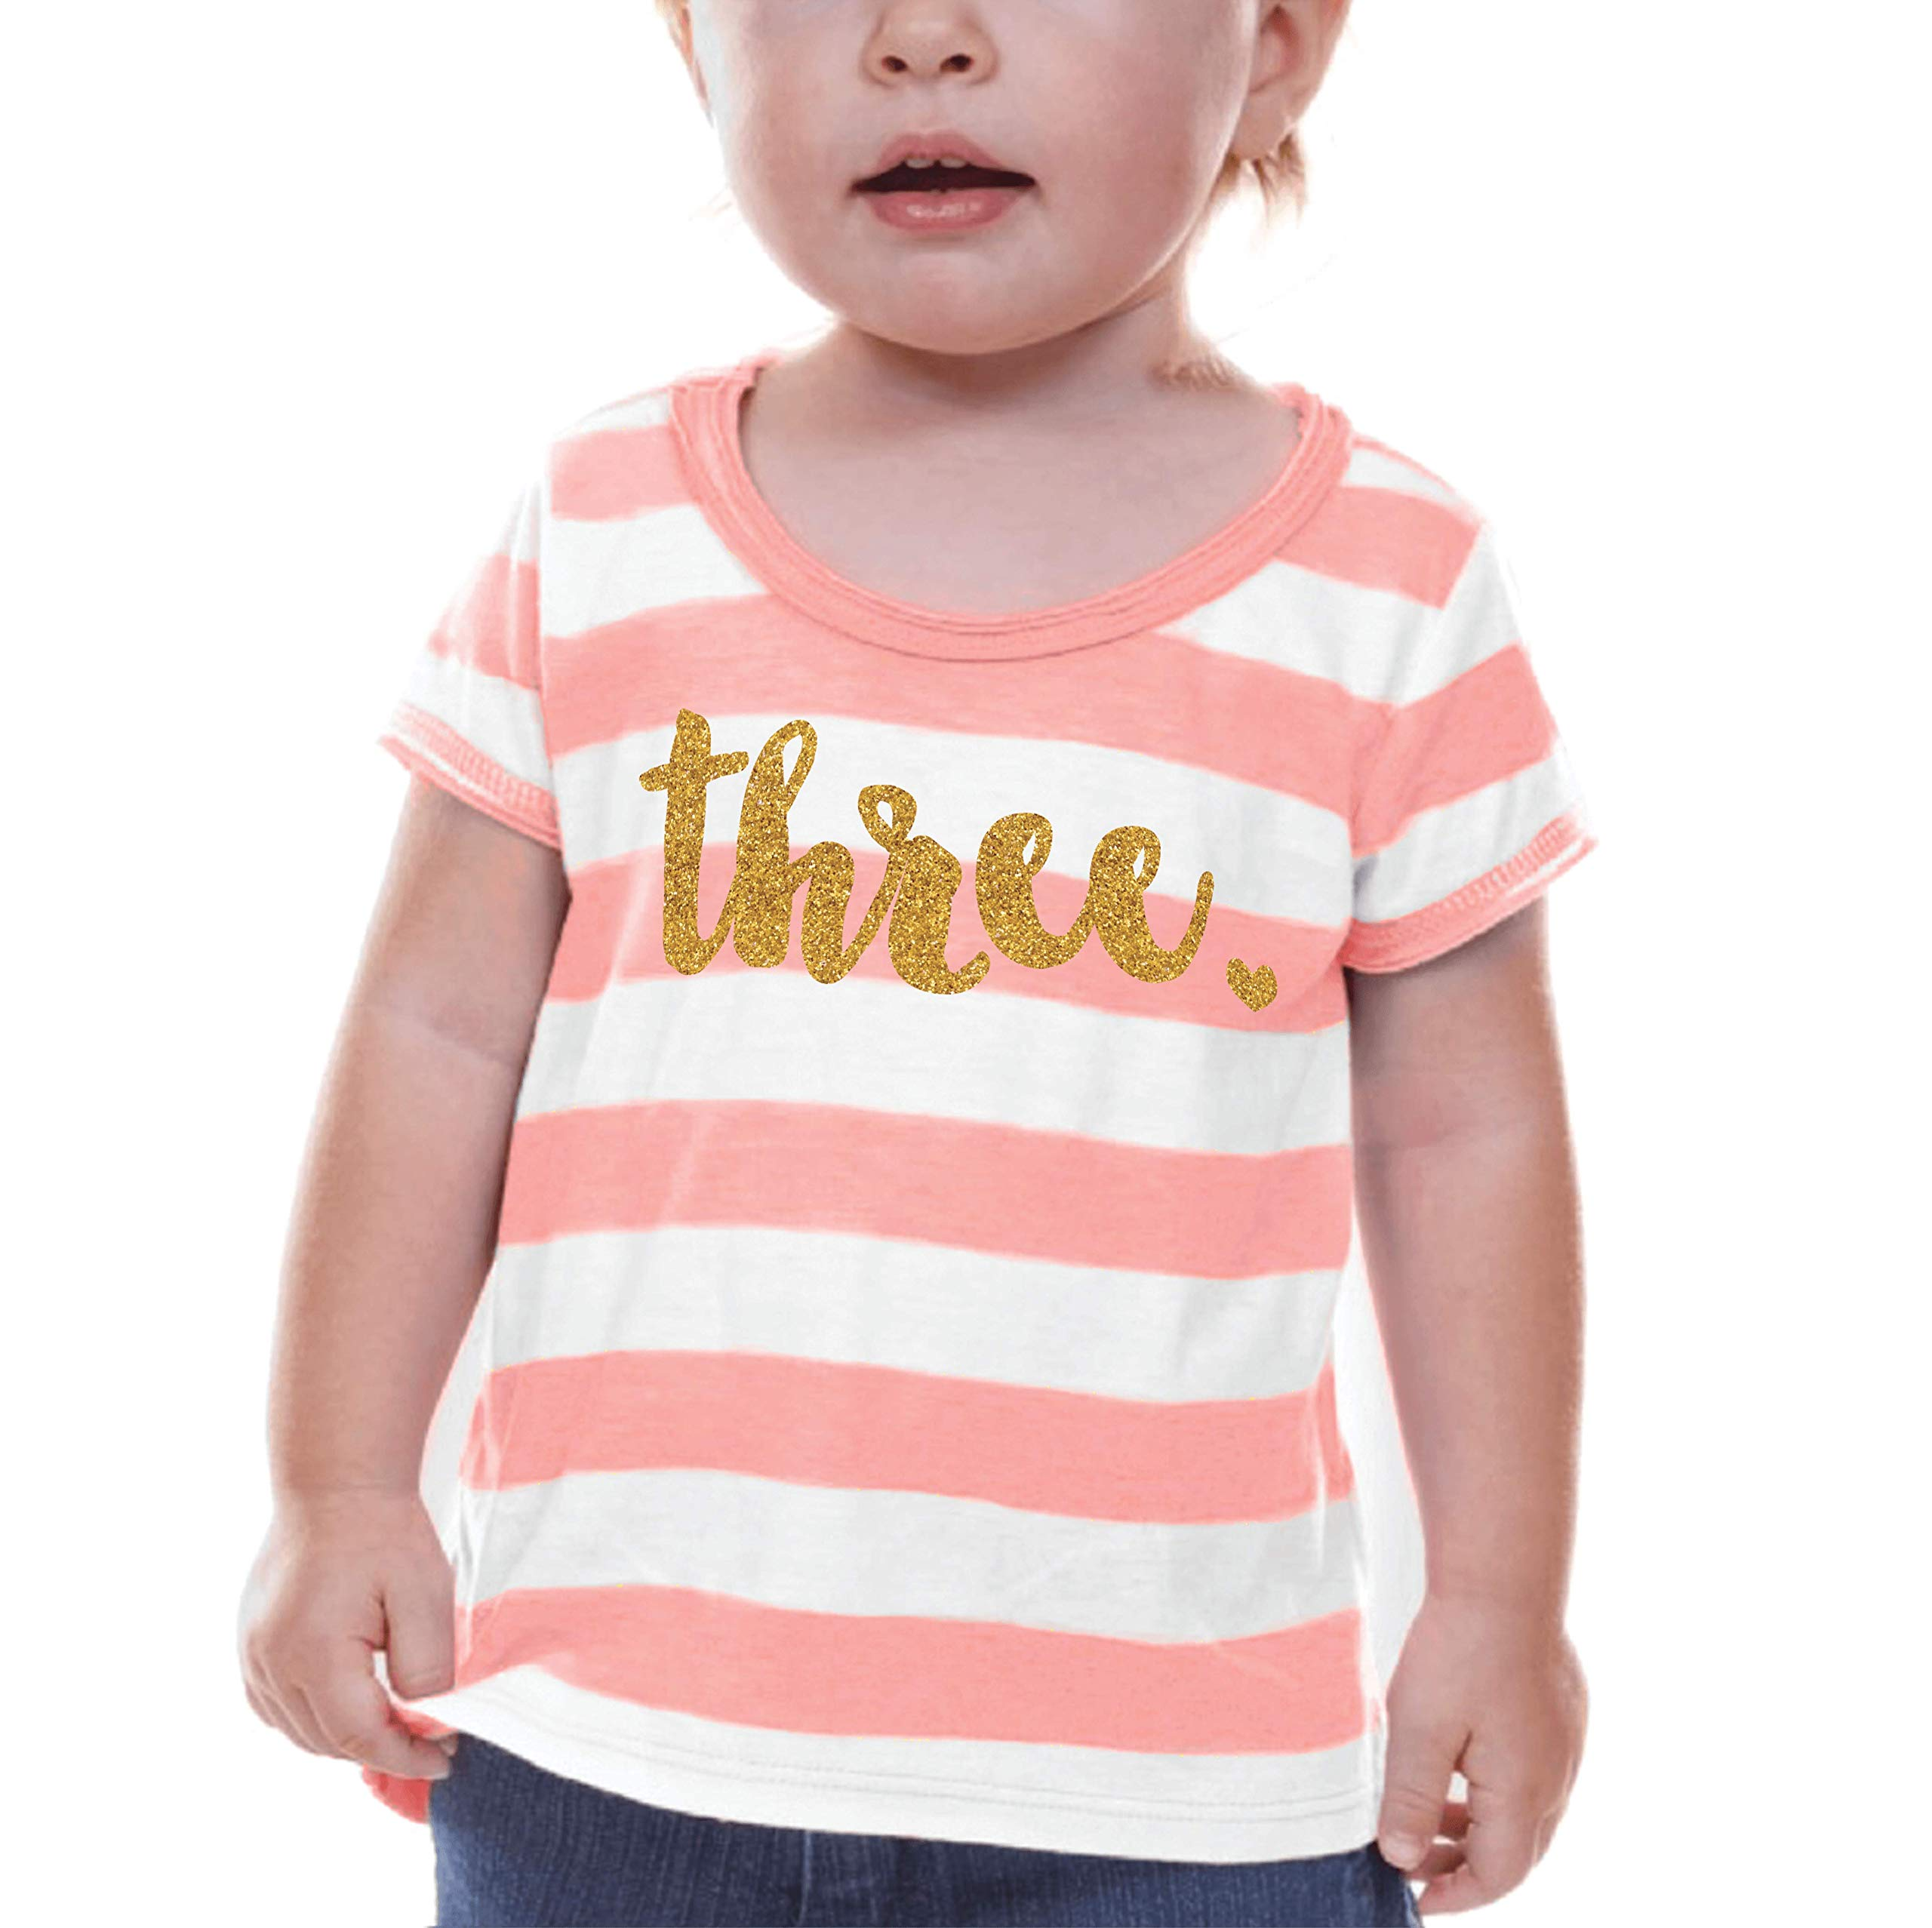 Bump and Beyond Designs Third Birthday Shirt Girl Third Birthday Outfit